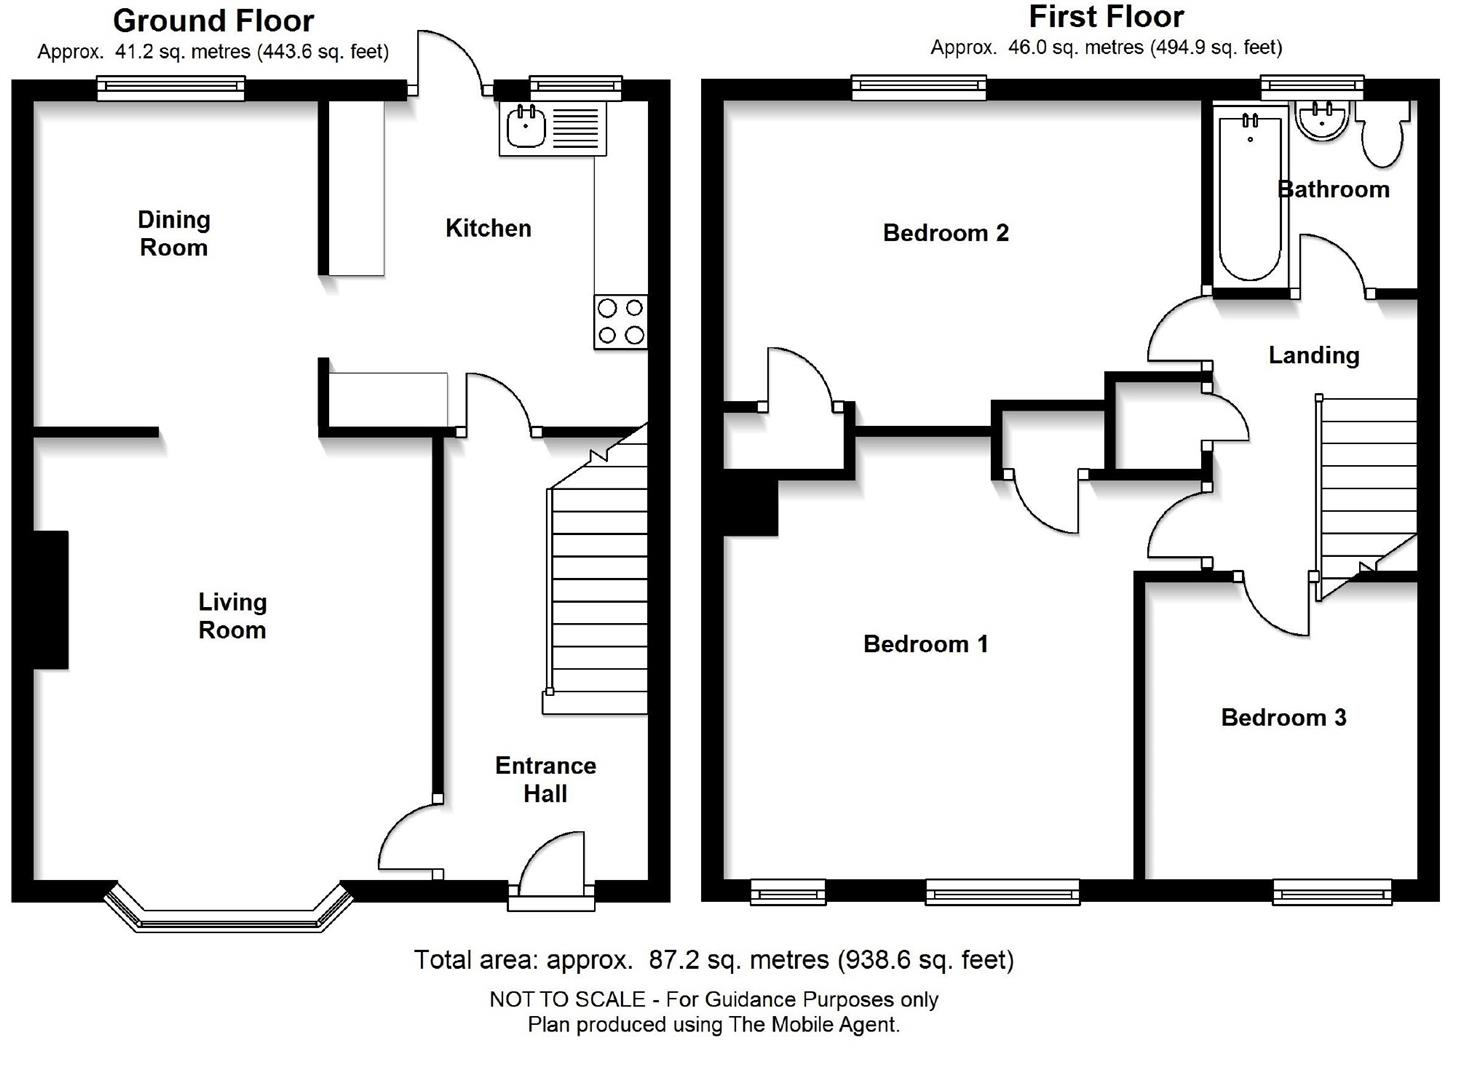 Ditton Lane, Cambridge, Cambridge floorplan